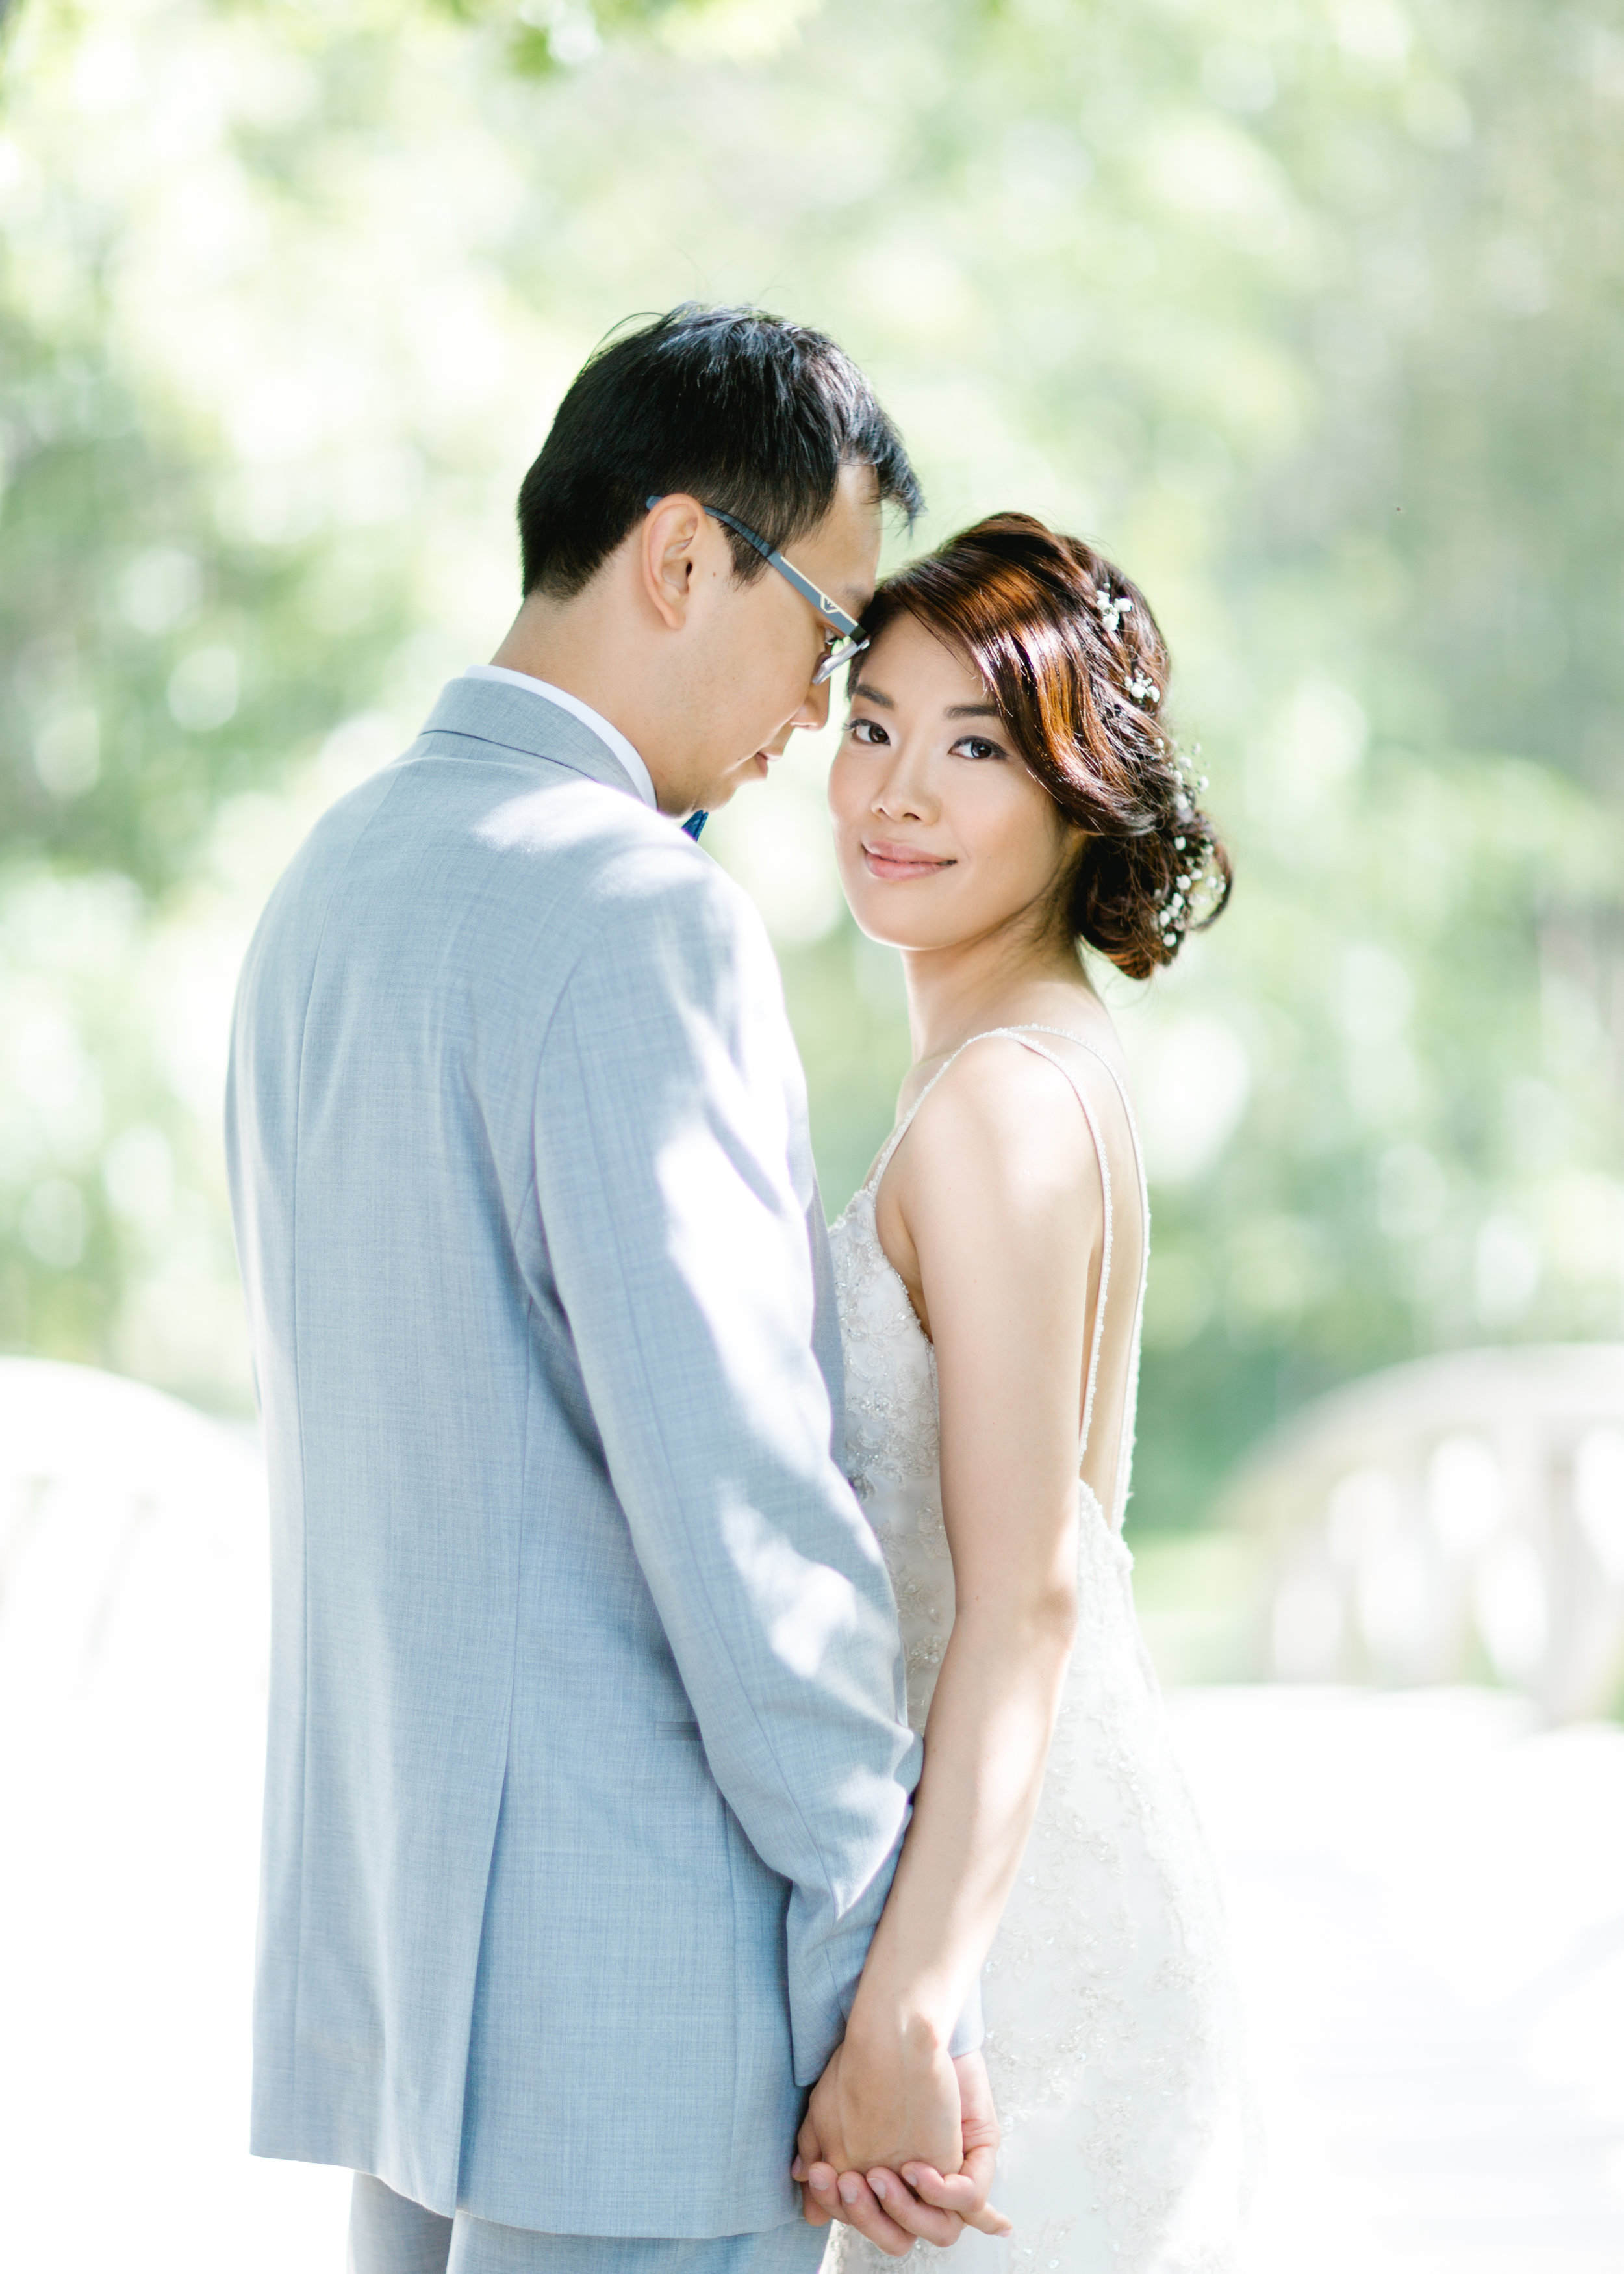 herafilms_wedding_hannah_david_hera_selects-50.jpg